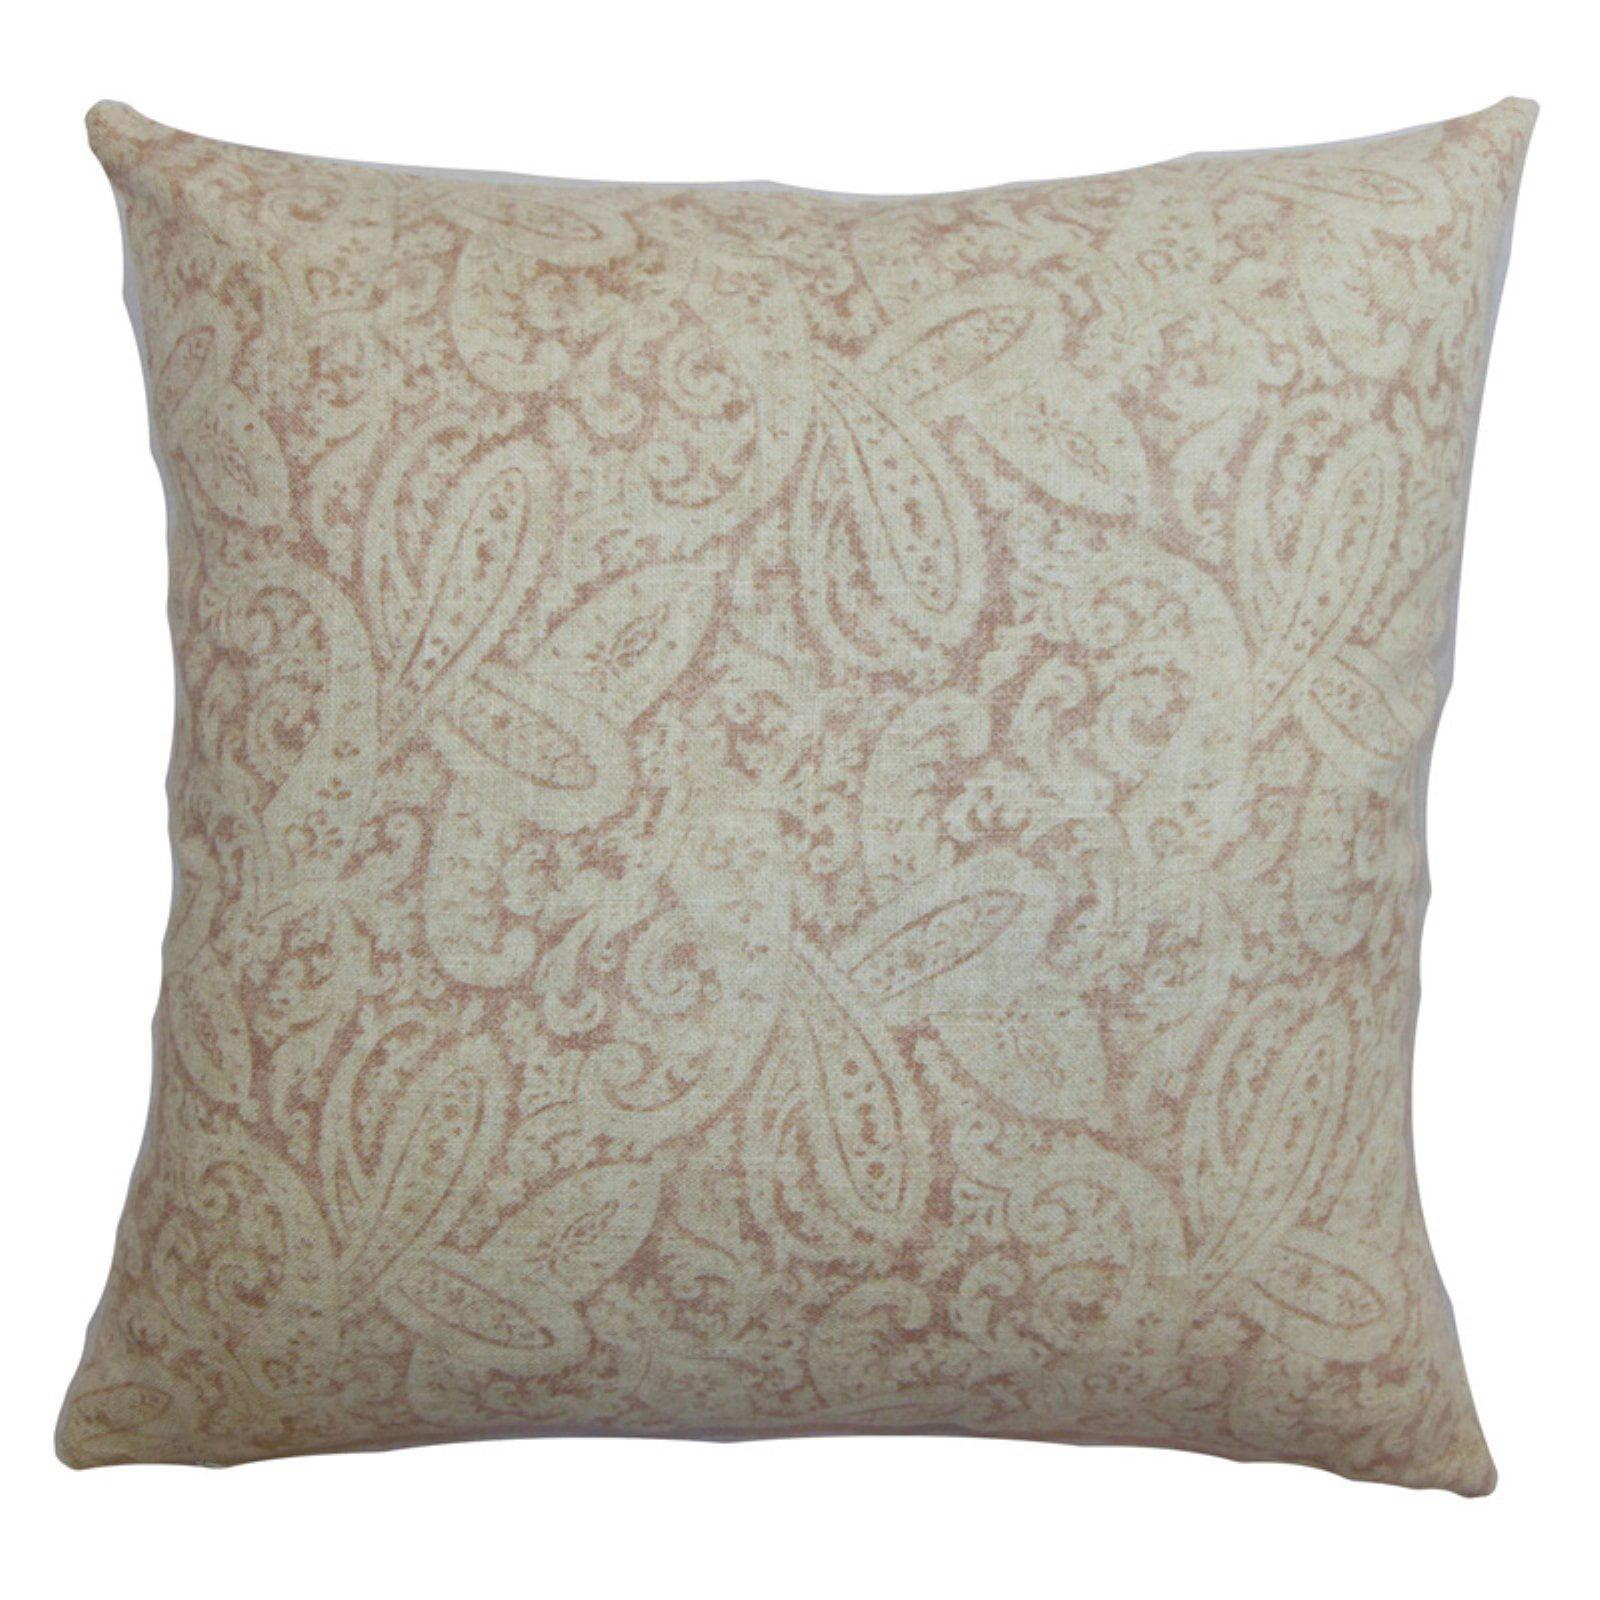 The Pillow Collection Benigna Paisley Pillow